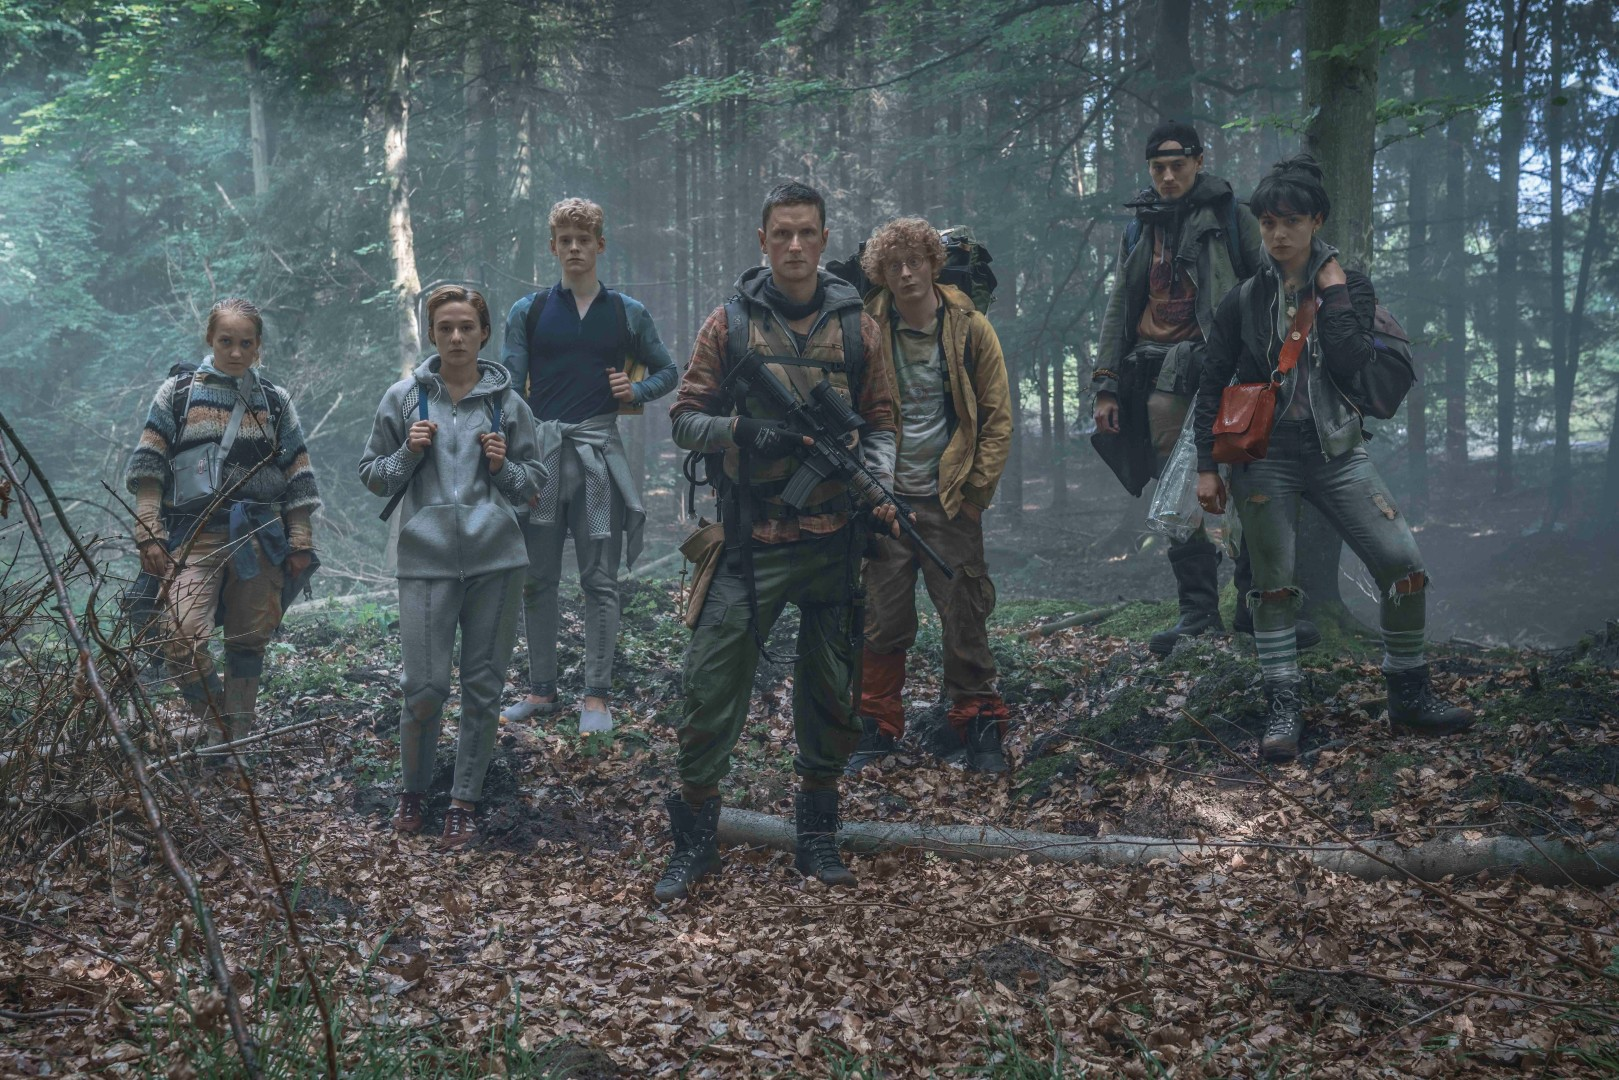 'The Rain': Anuncio de la primera serie original danesa de Netflix